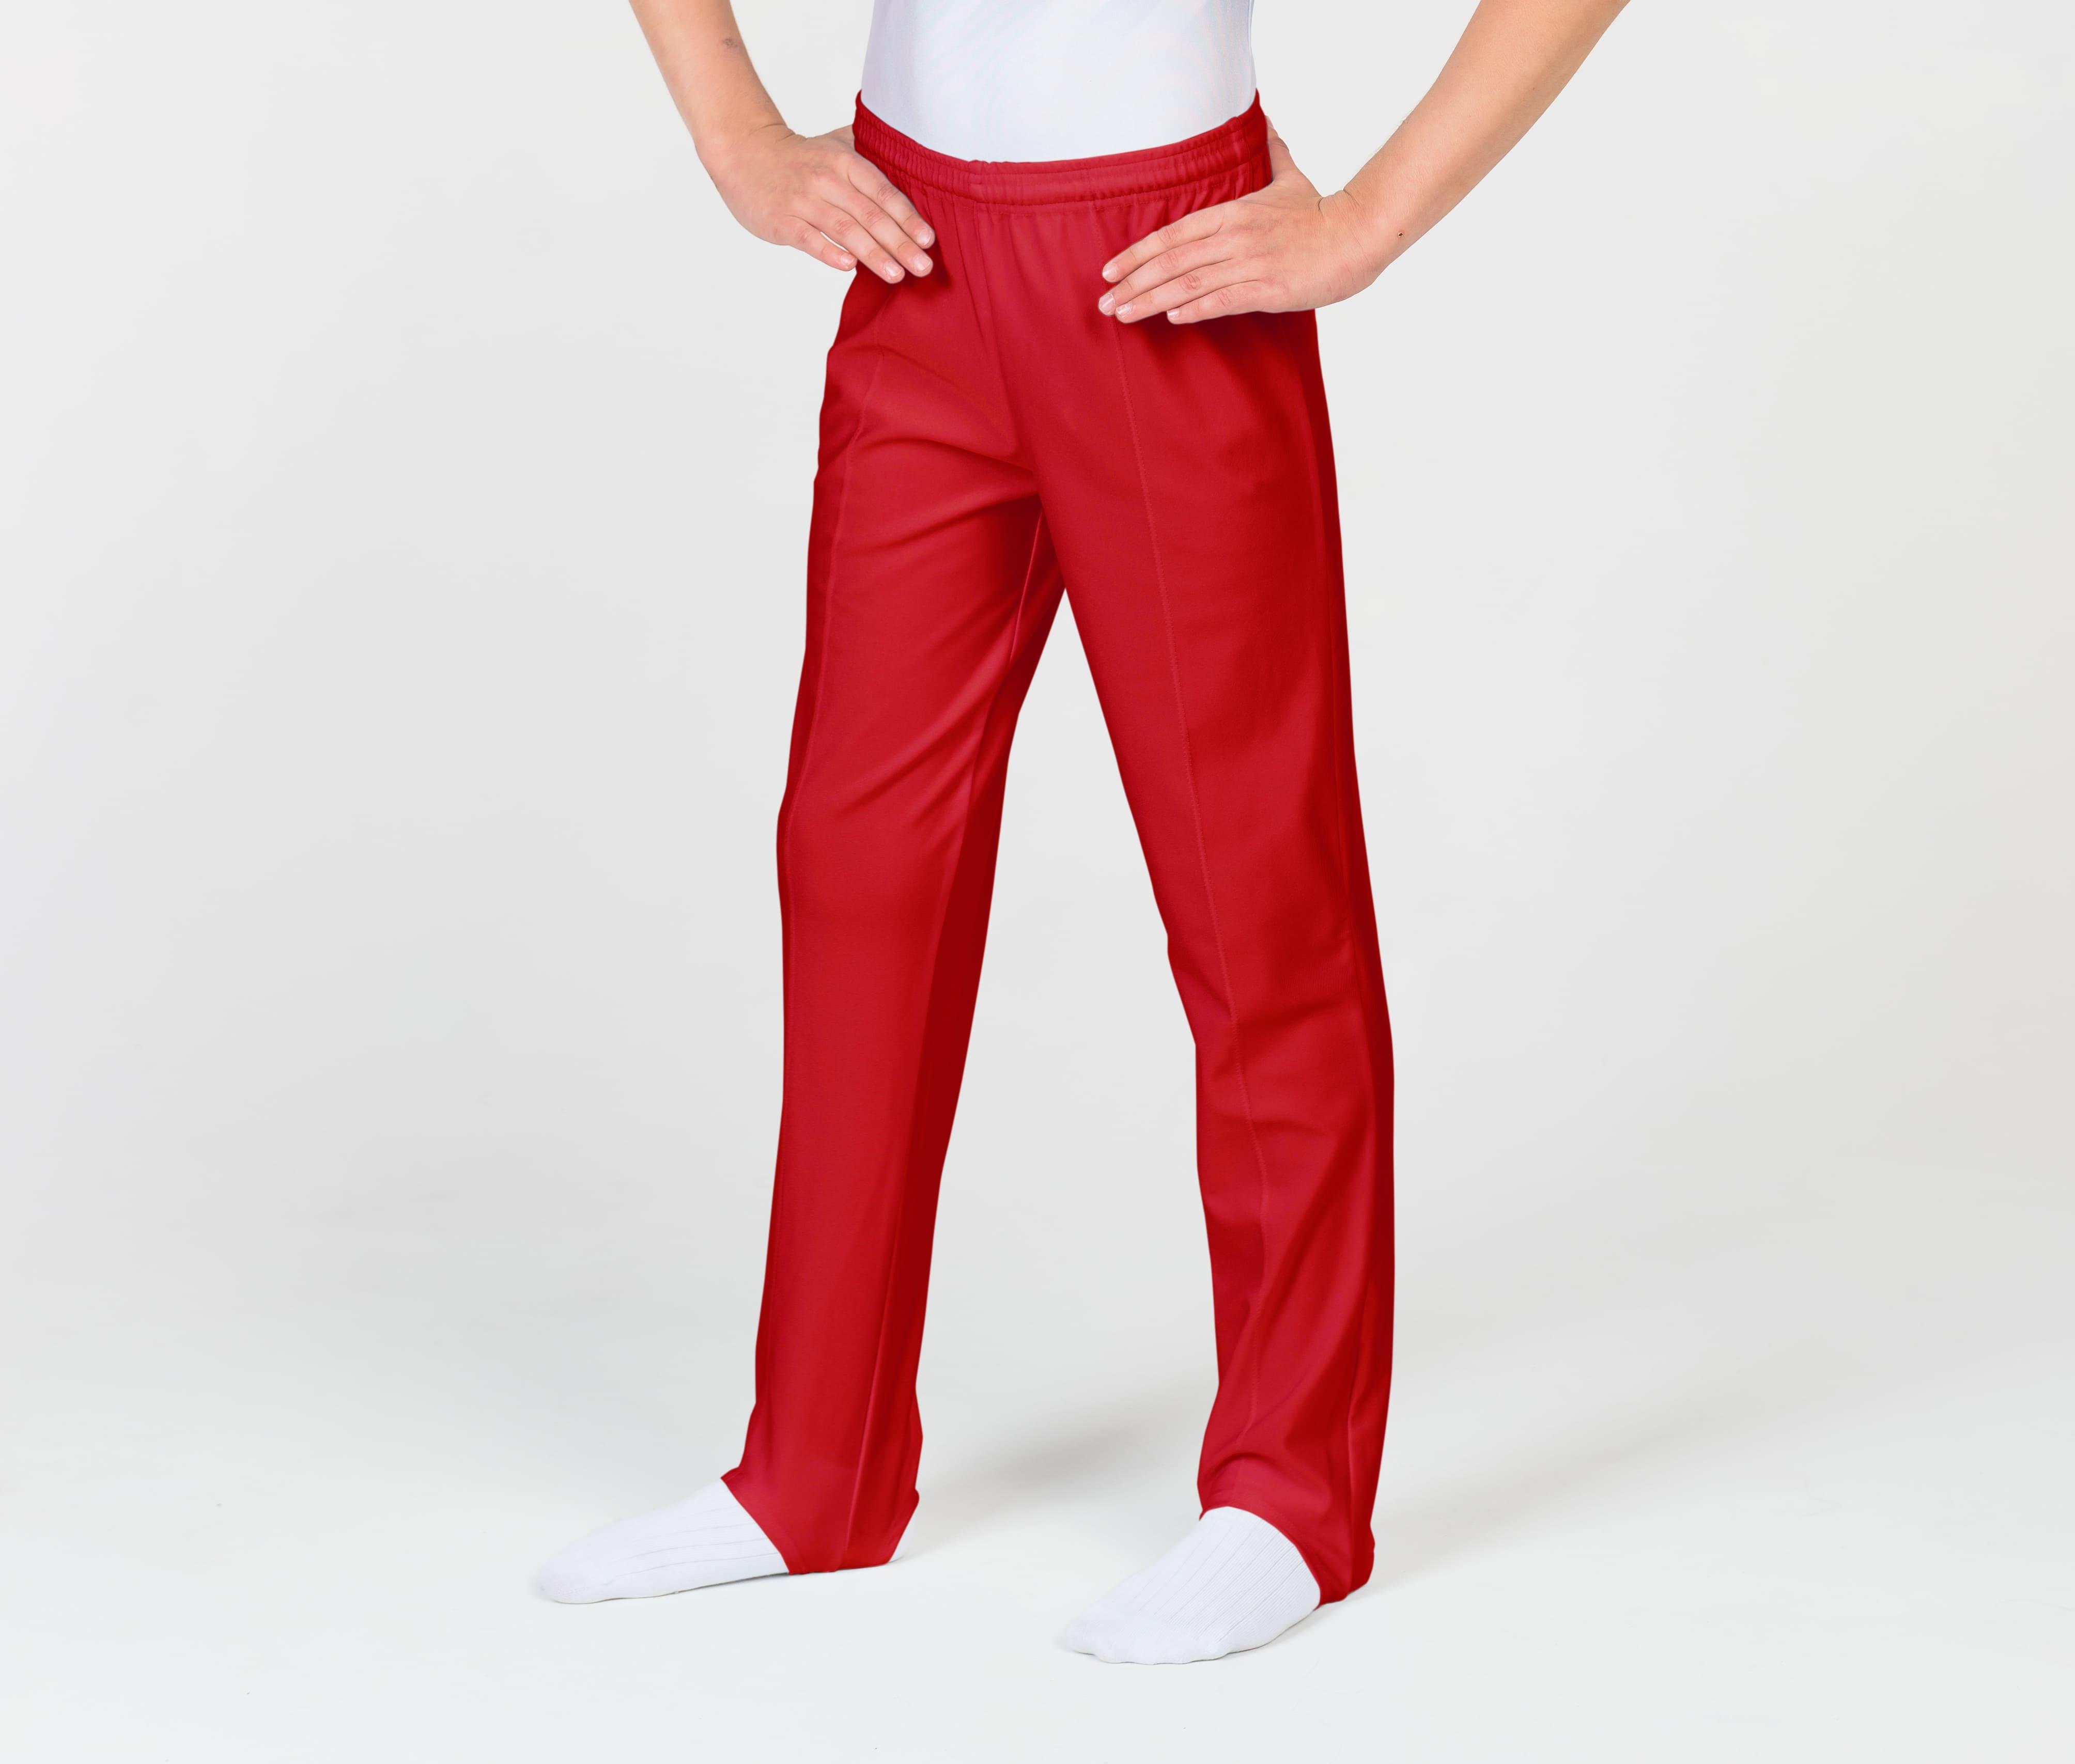 Men's Leotards, Gymnastic pants (male), pic 2